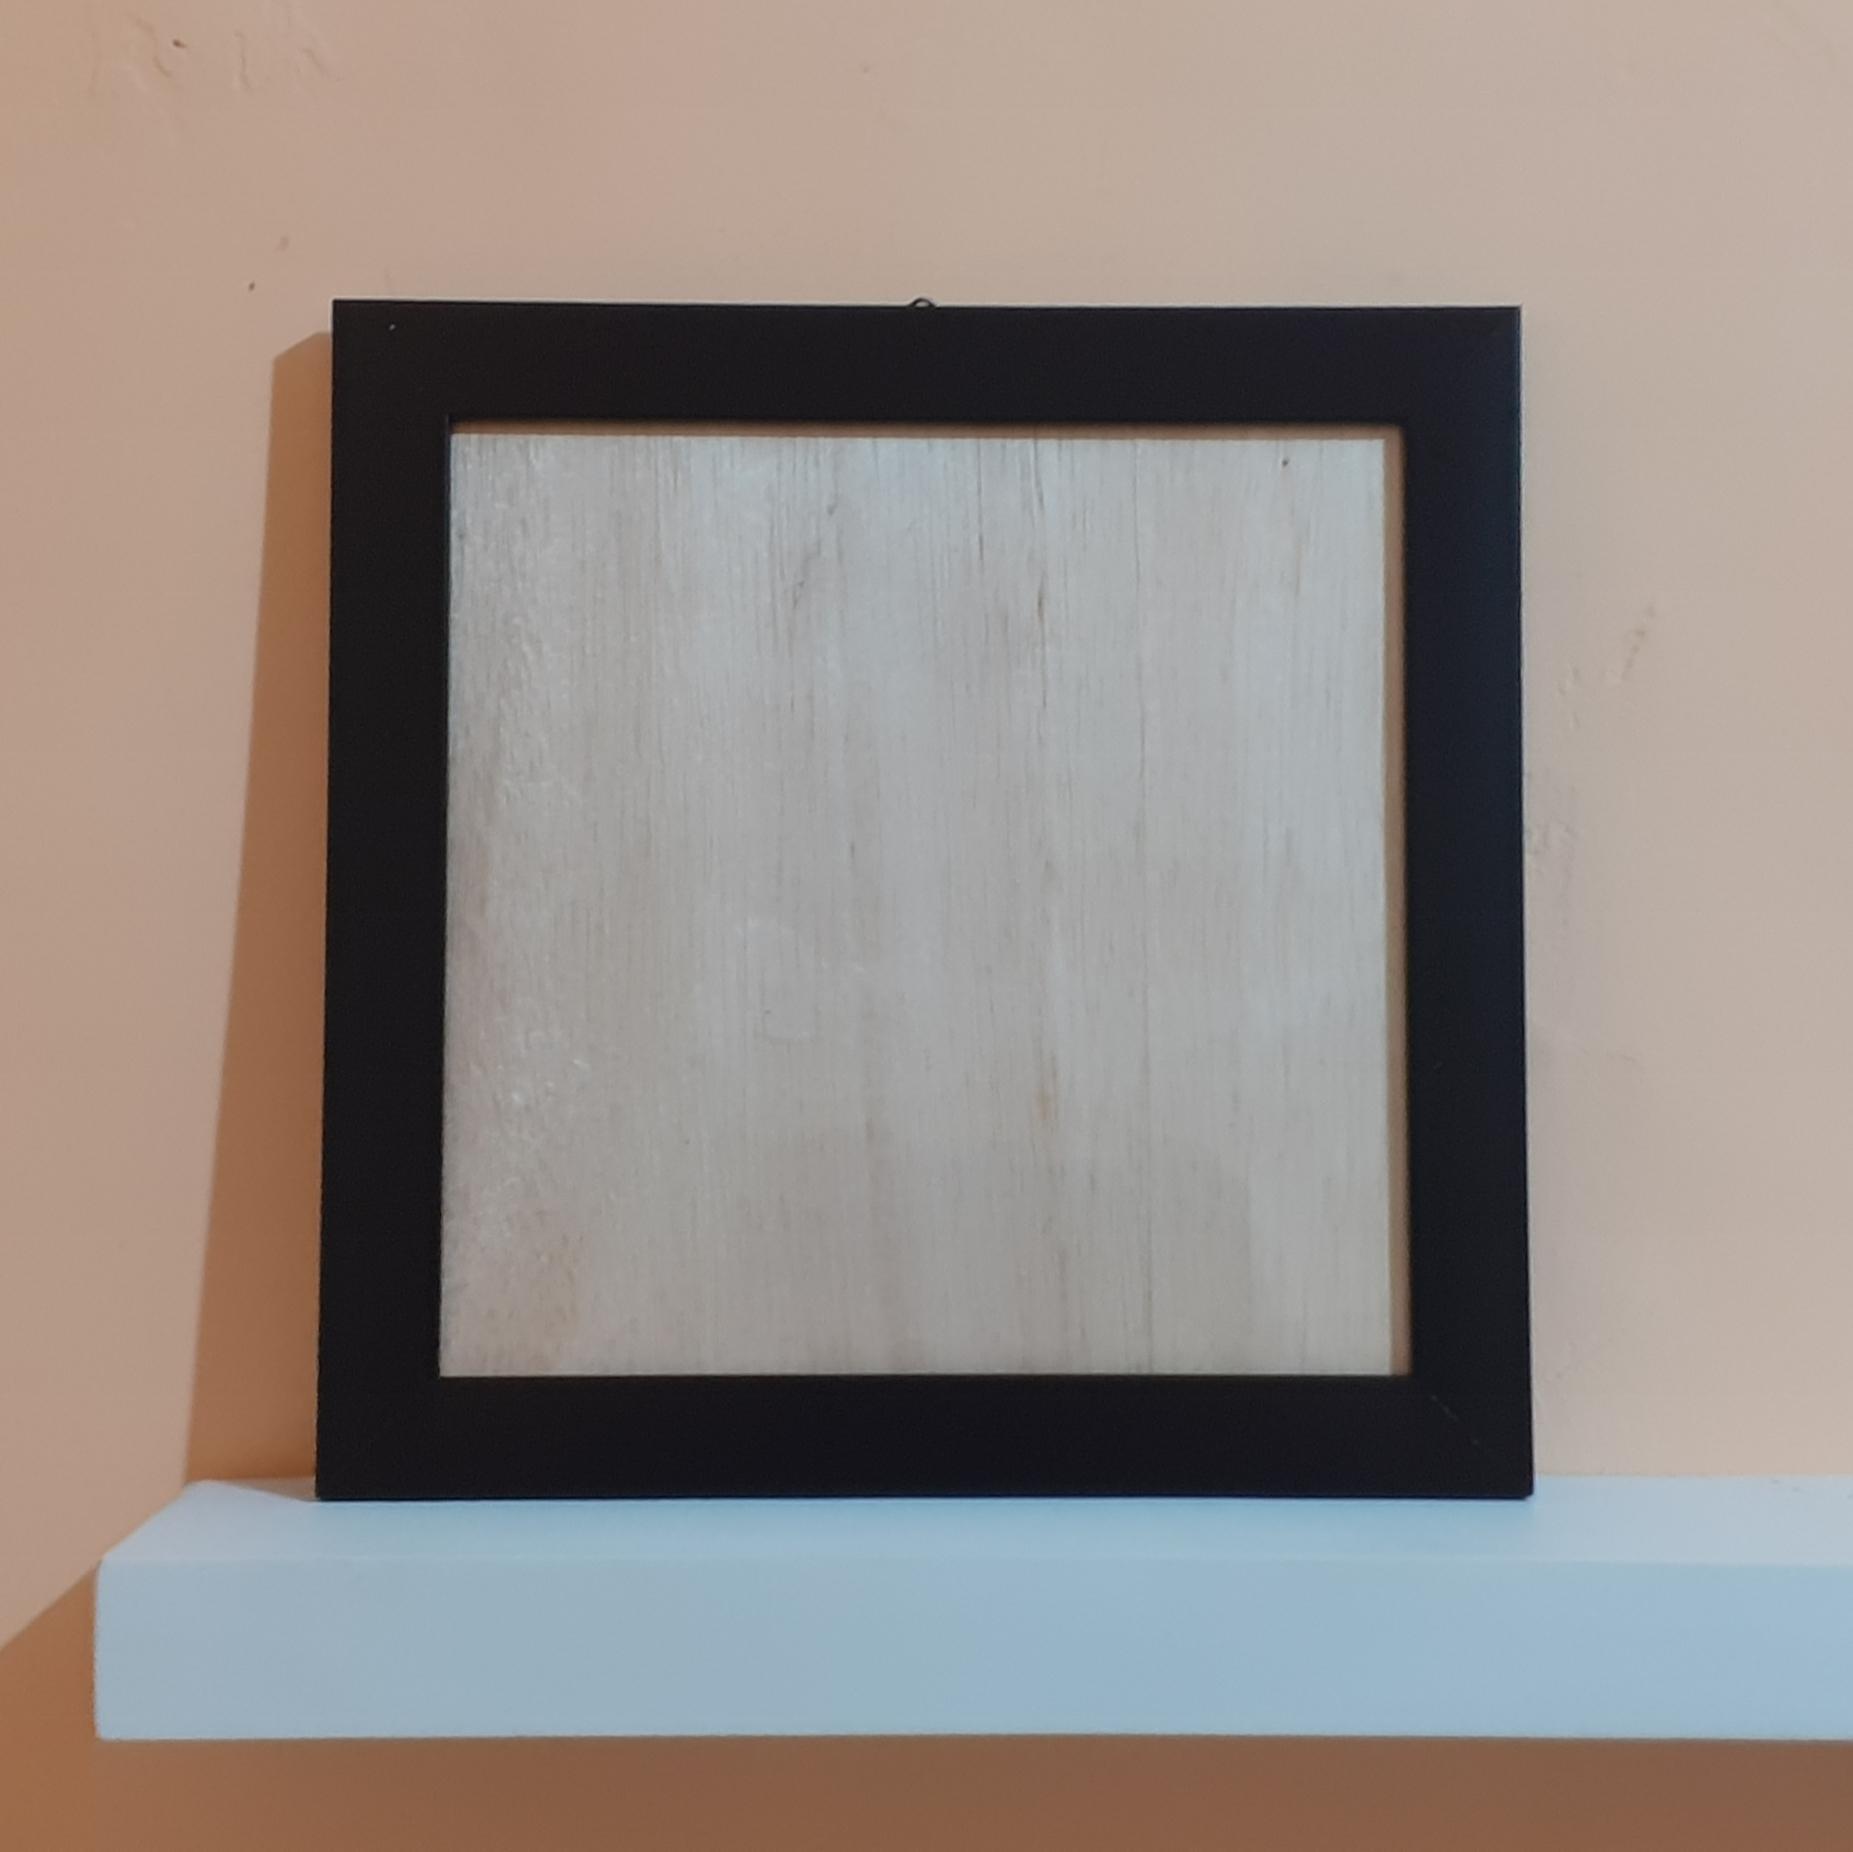 Fiber Frame (25X25 cm)